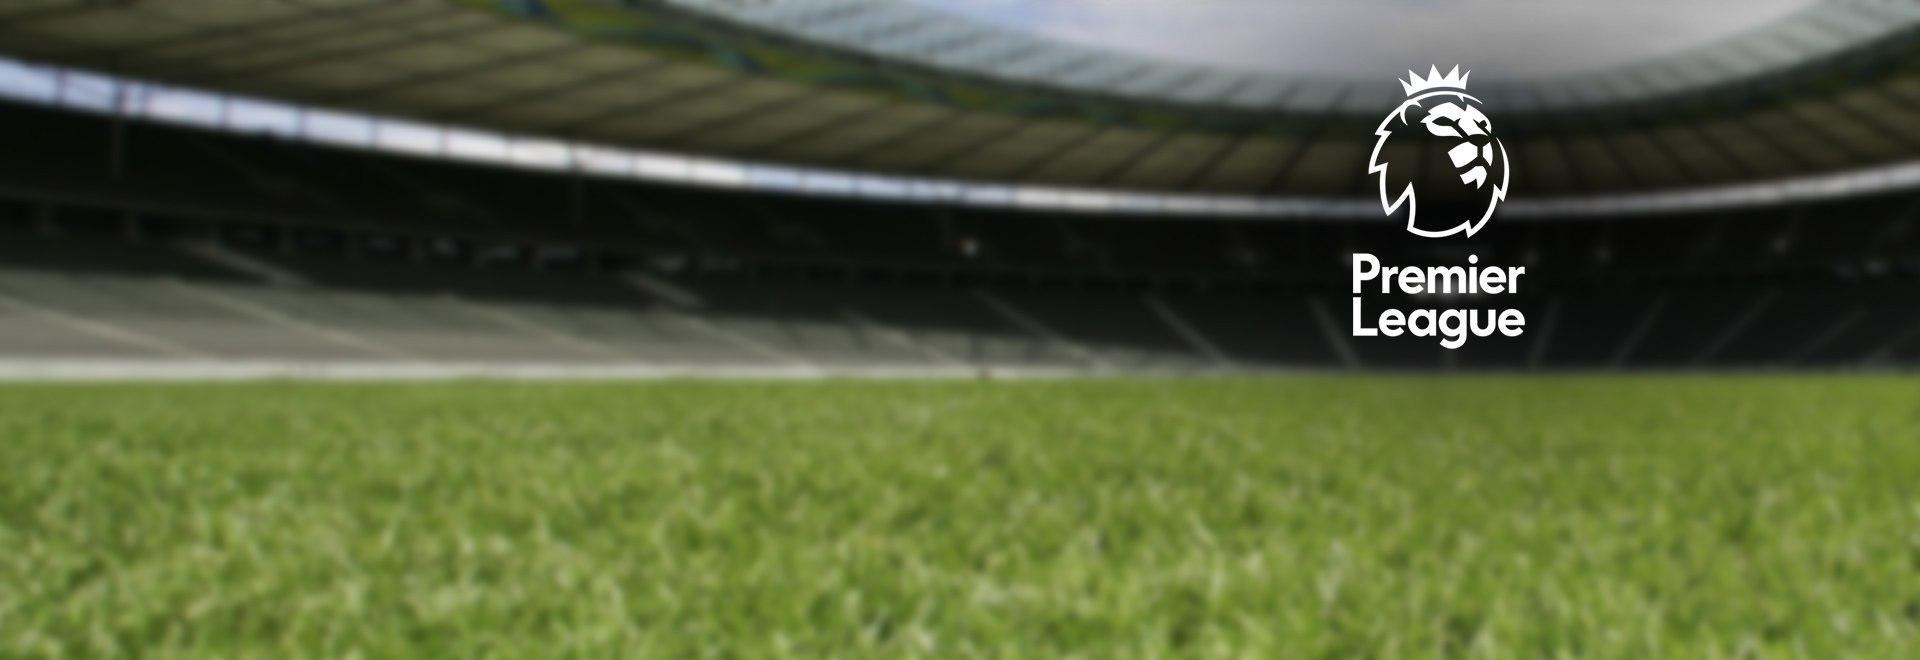 Manchester United - Wolverhampton. 16a g.